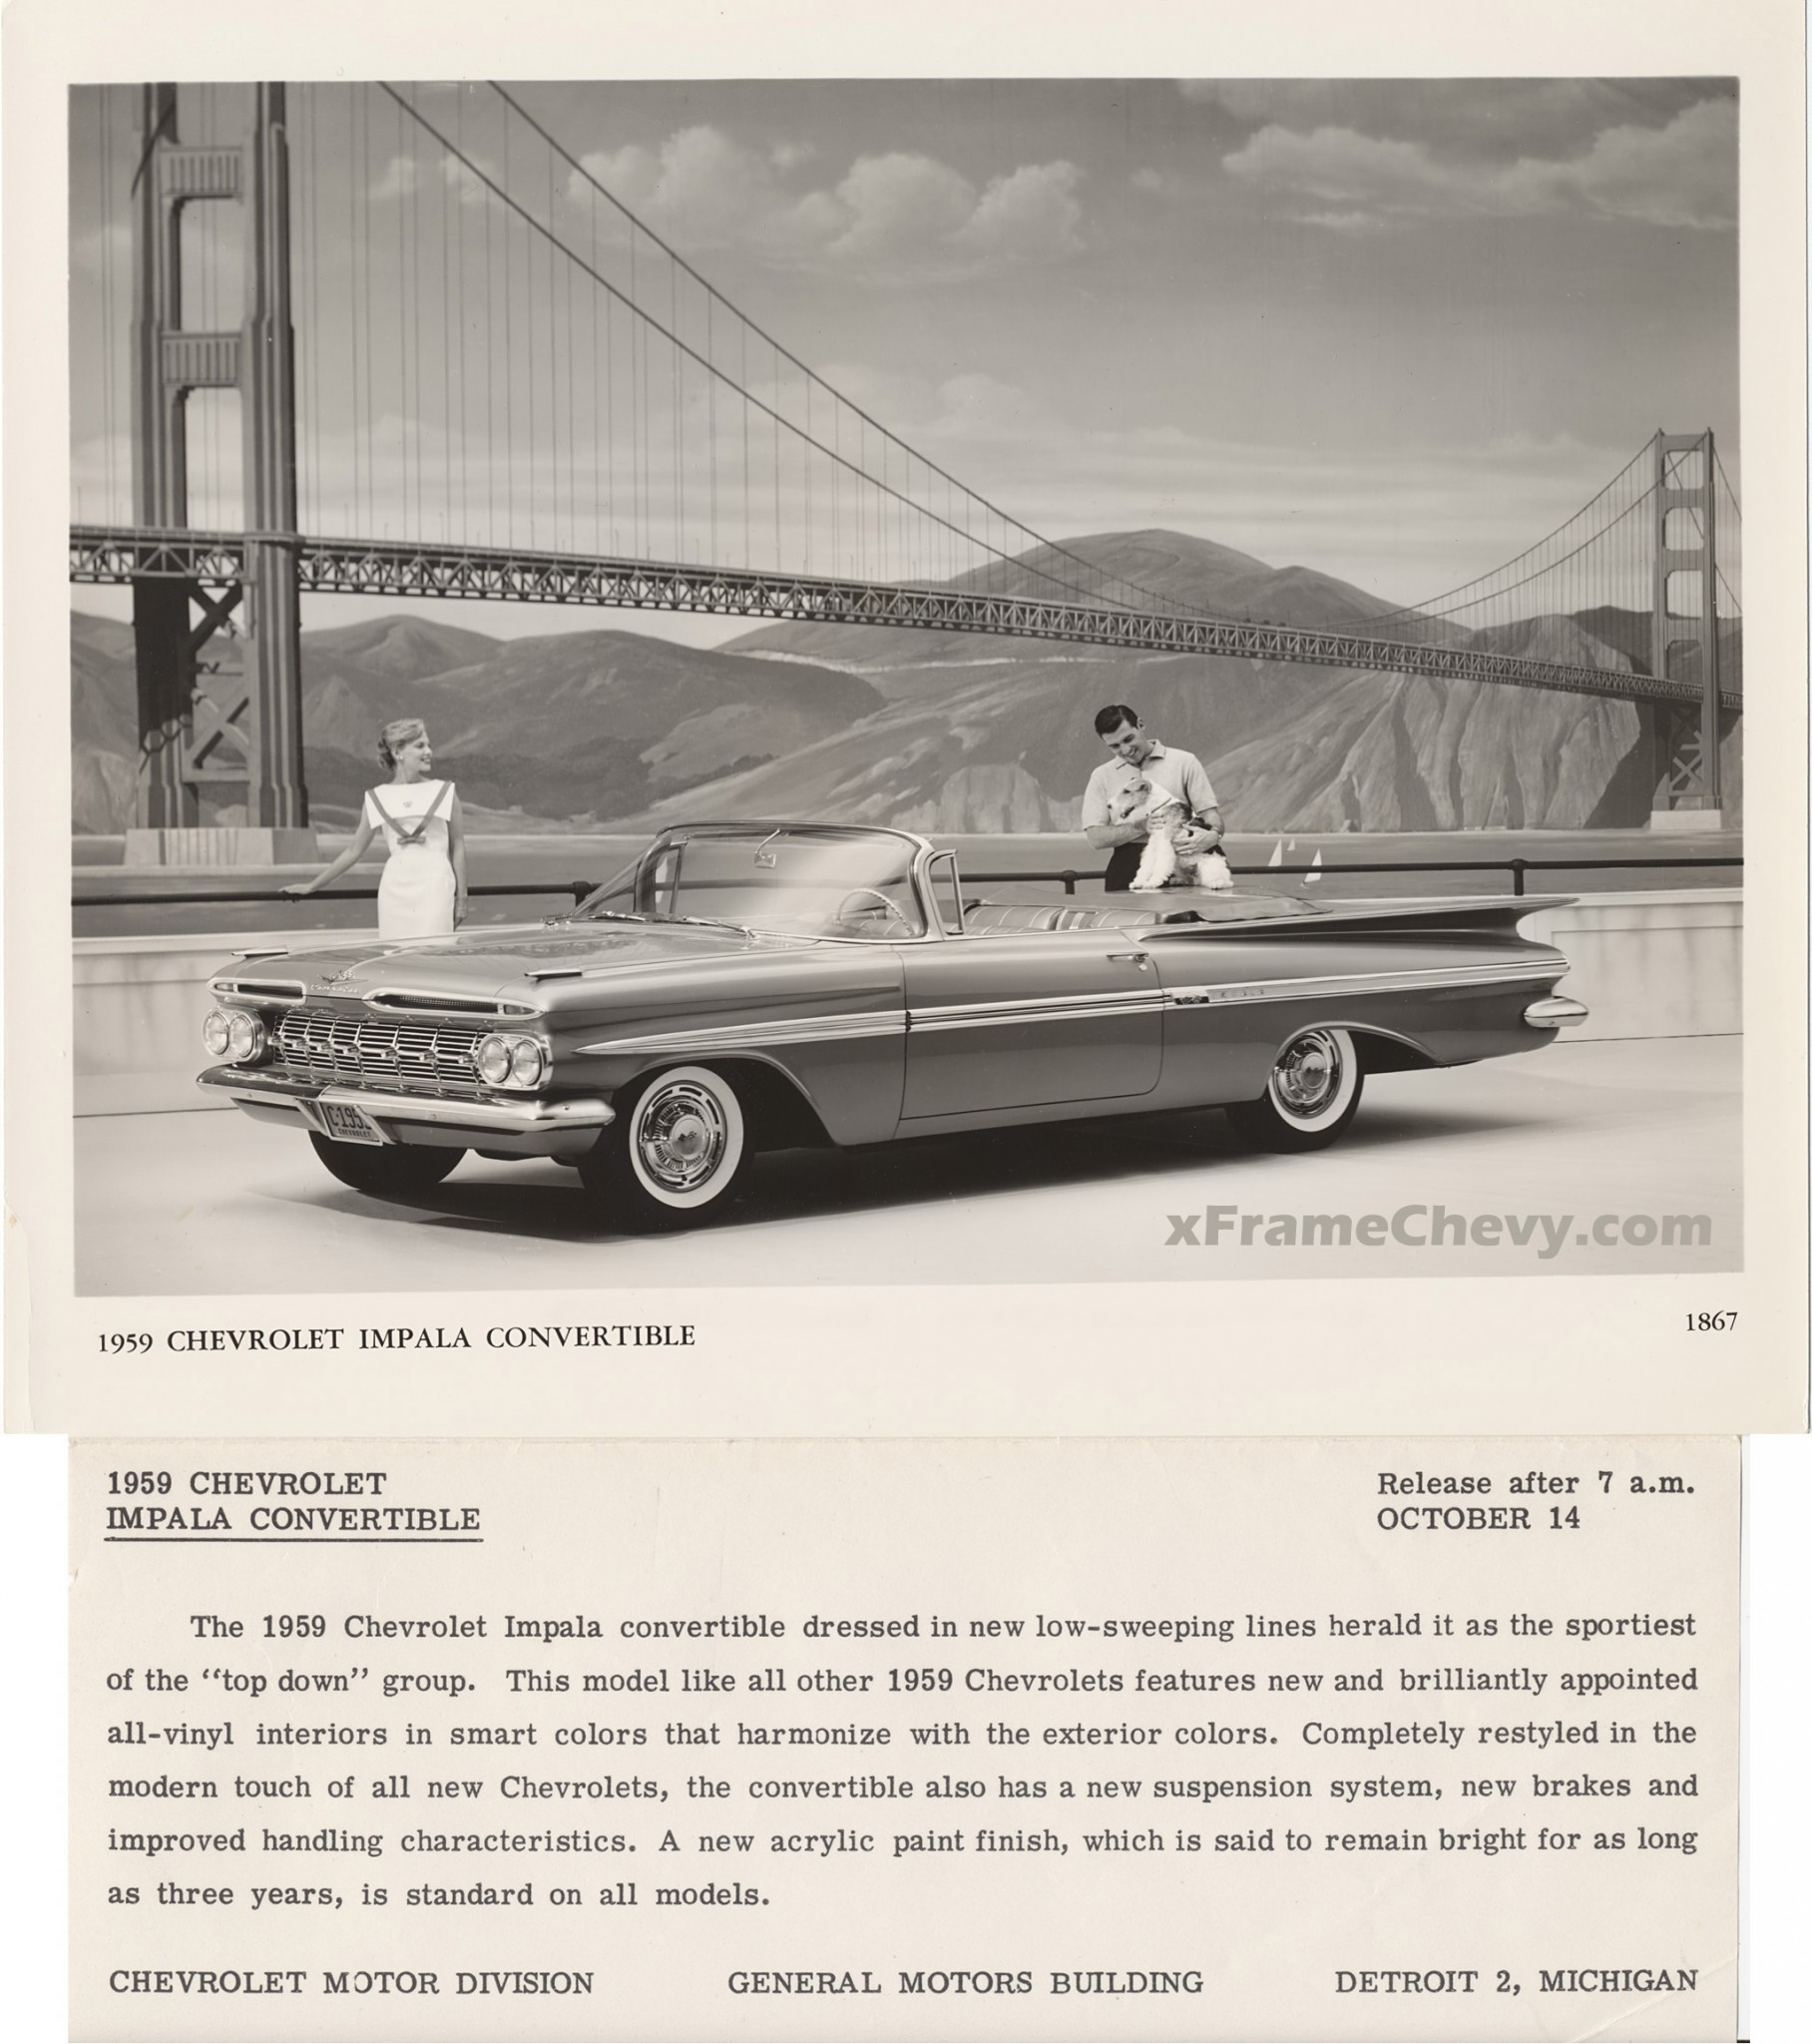 GM Photographic - 1959 Impala Convertible